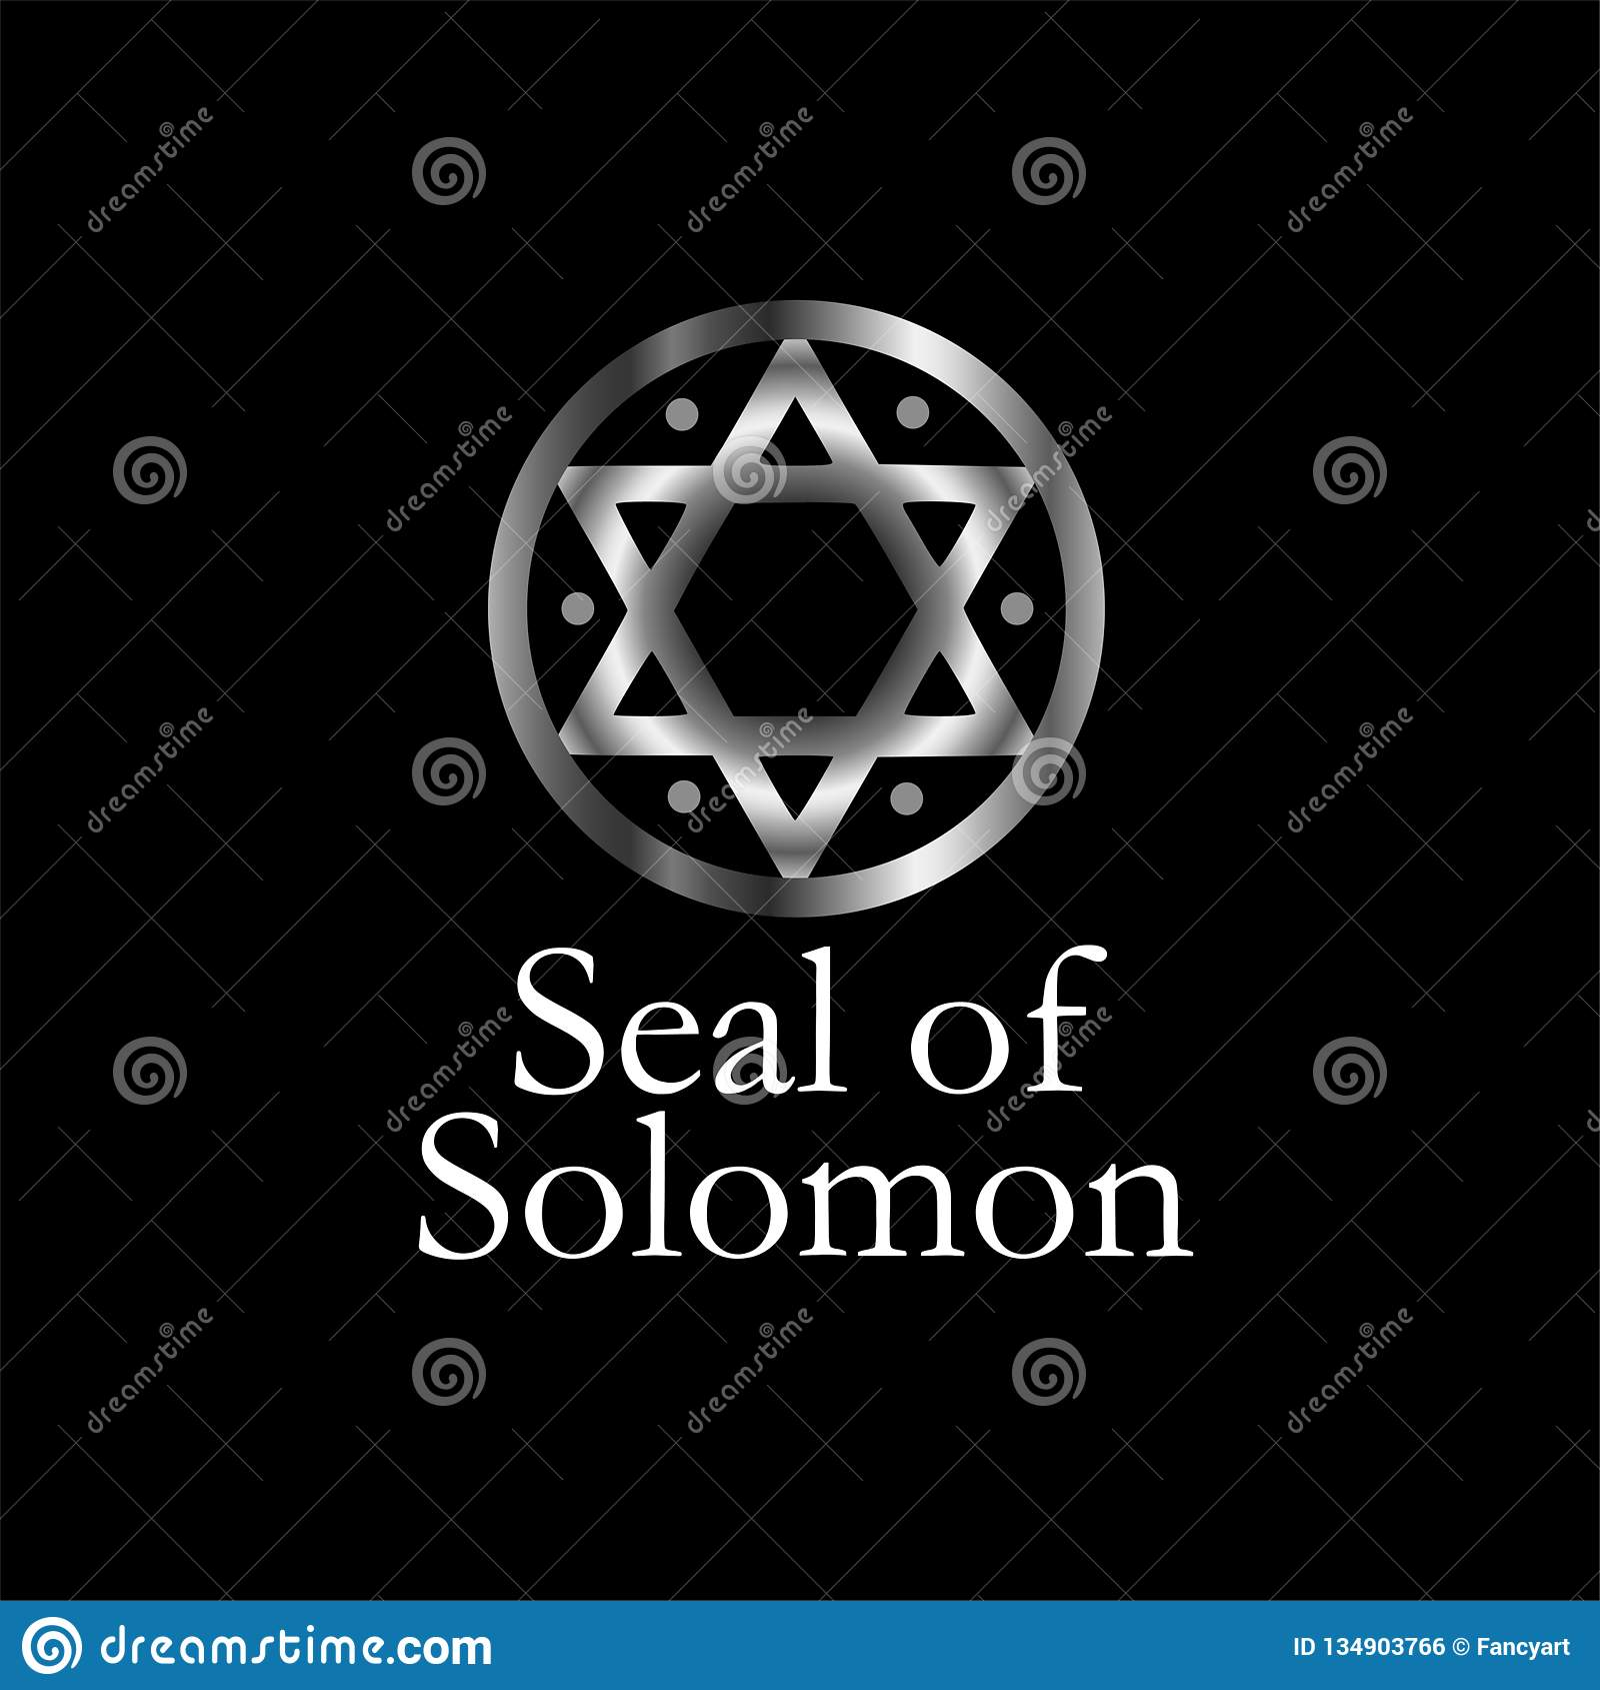 The seal of Solomon- a magical symbol or Hexagram